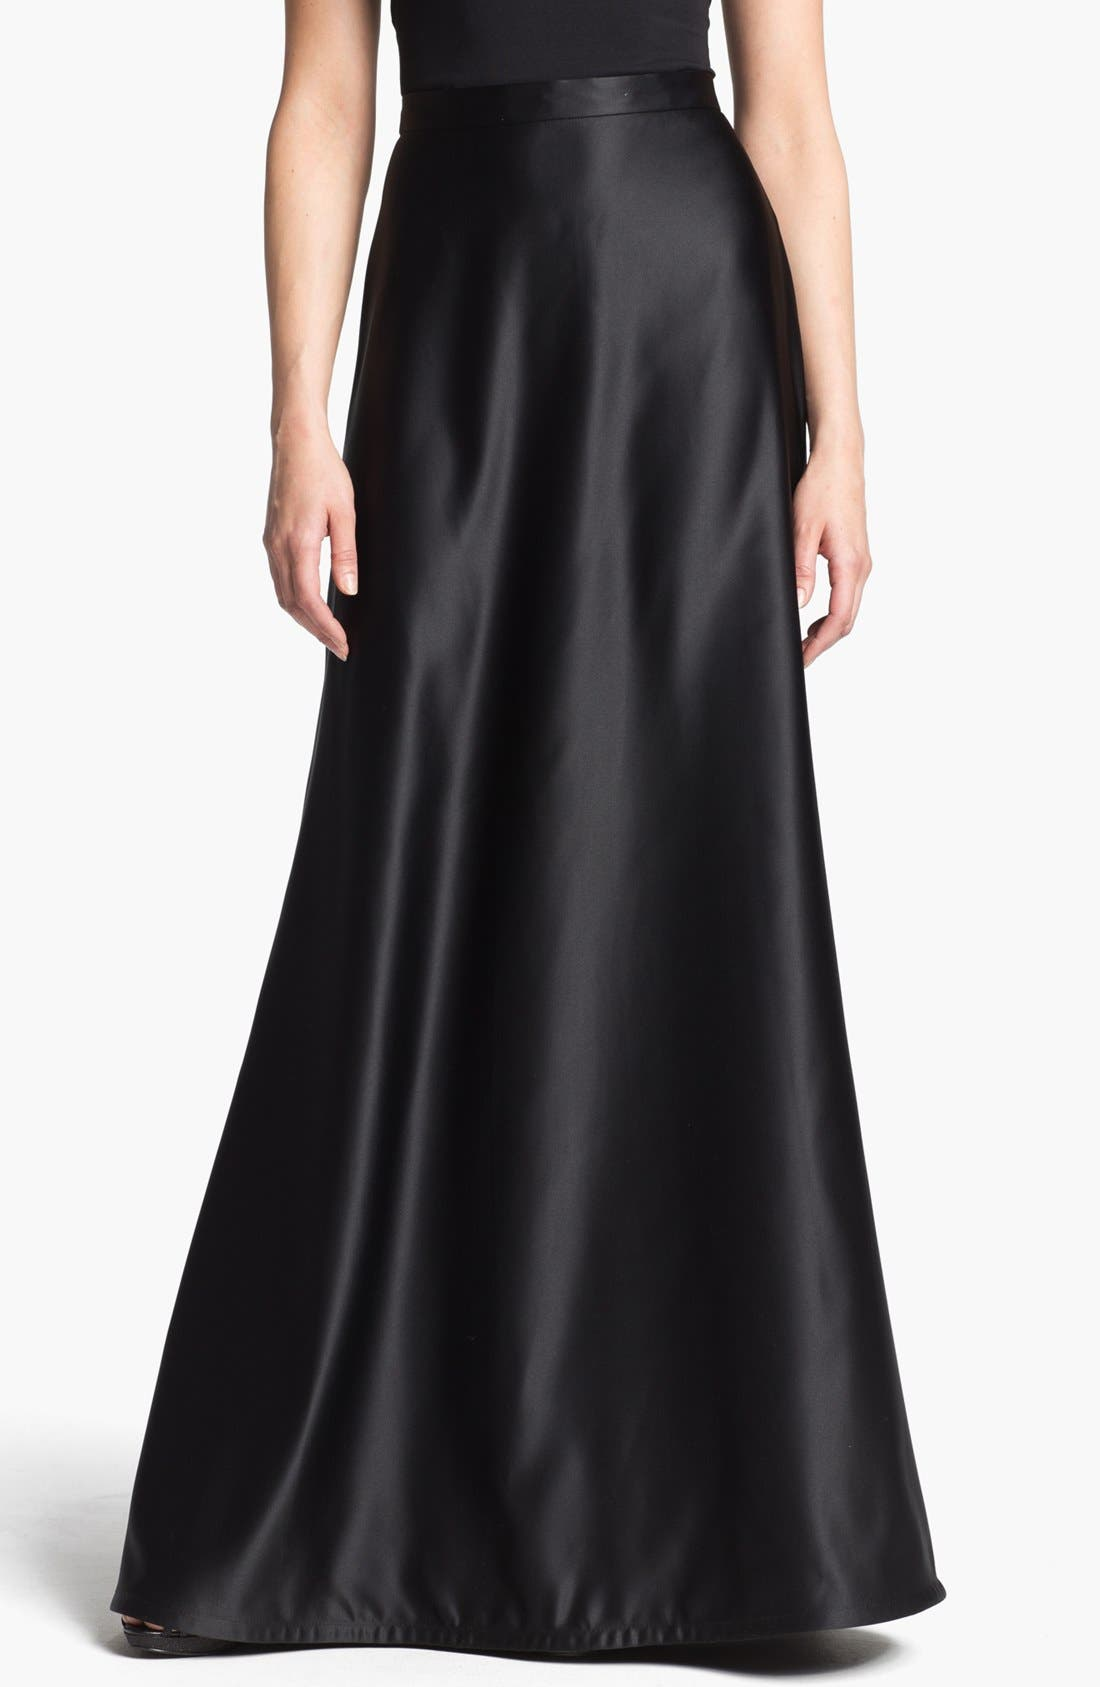 Alternate Image 1 Selected - Tadashi Shoji Satin A-Line Skirt